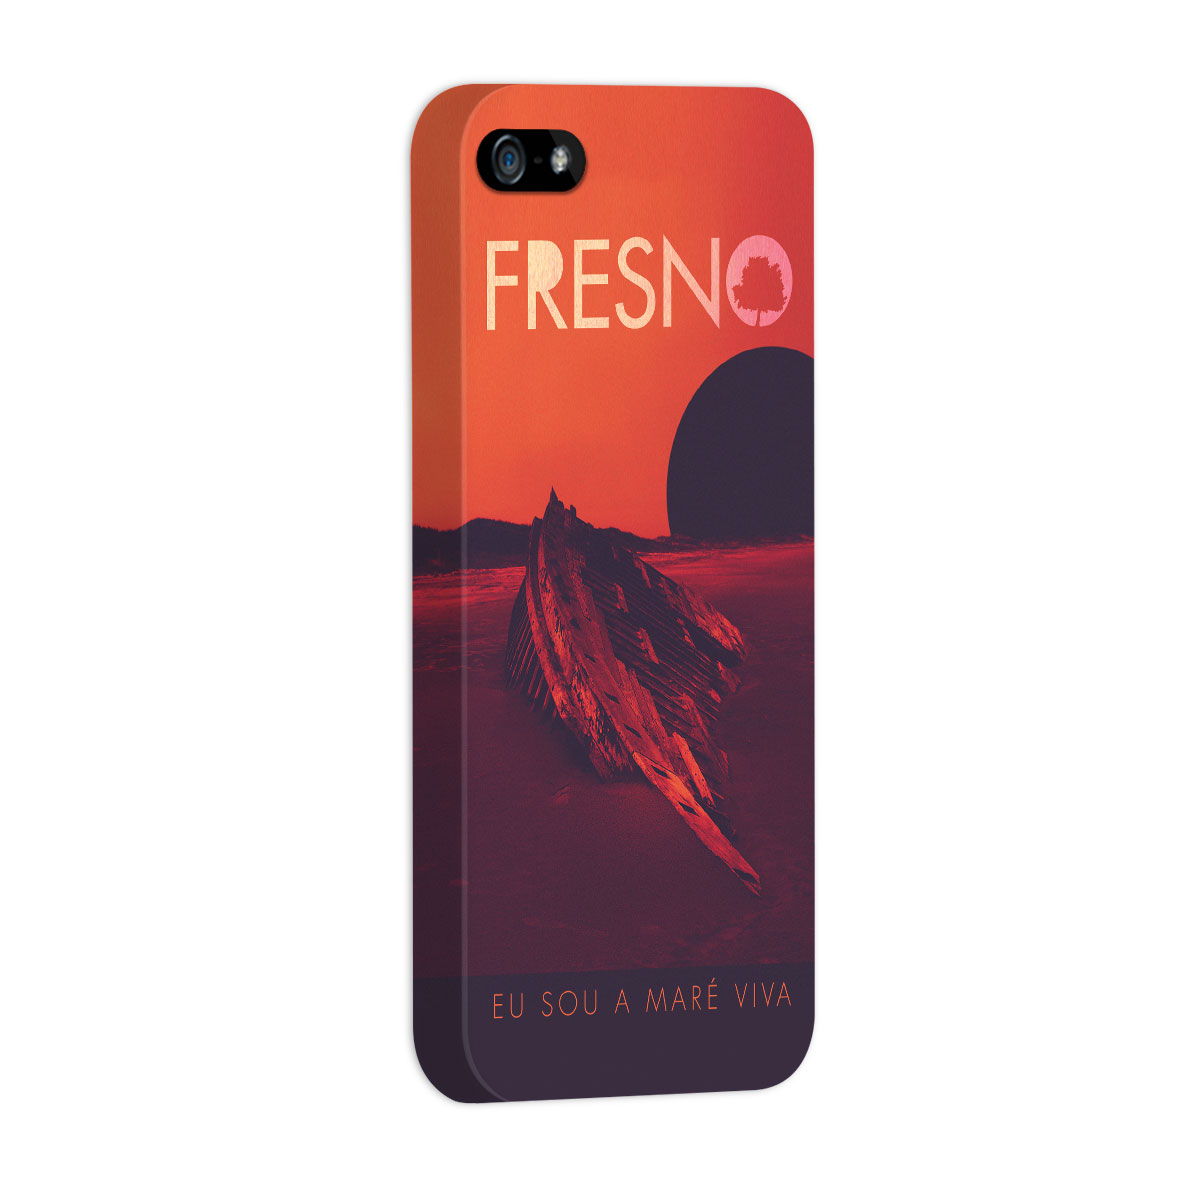 Capa de iPhone 5/5S Fresno Capa EP